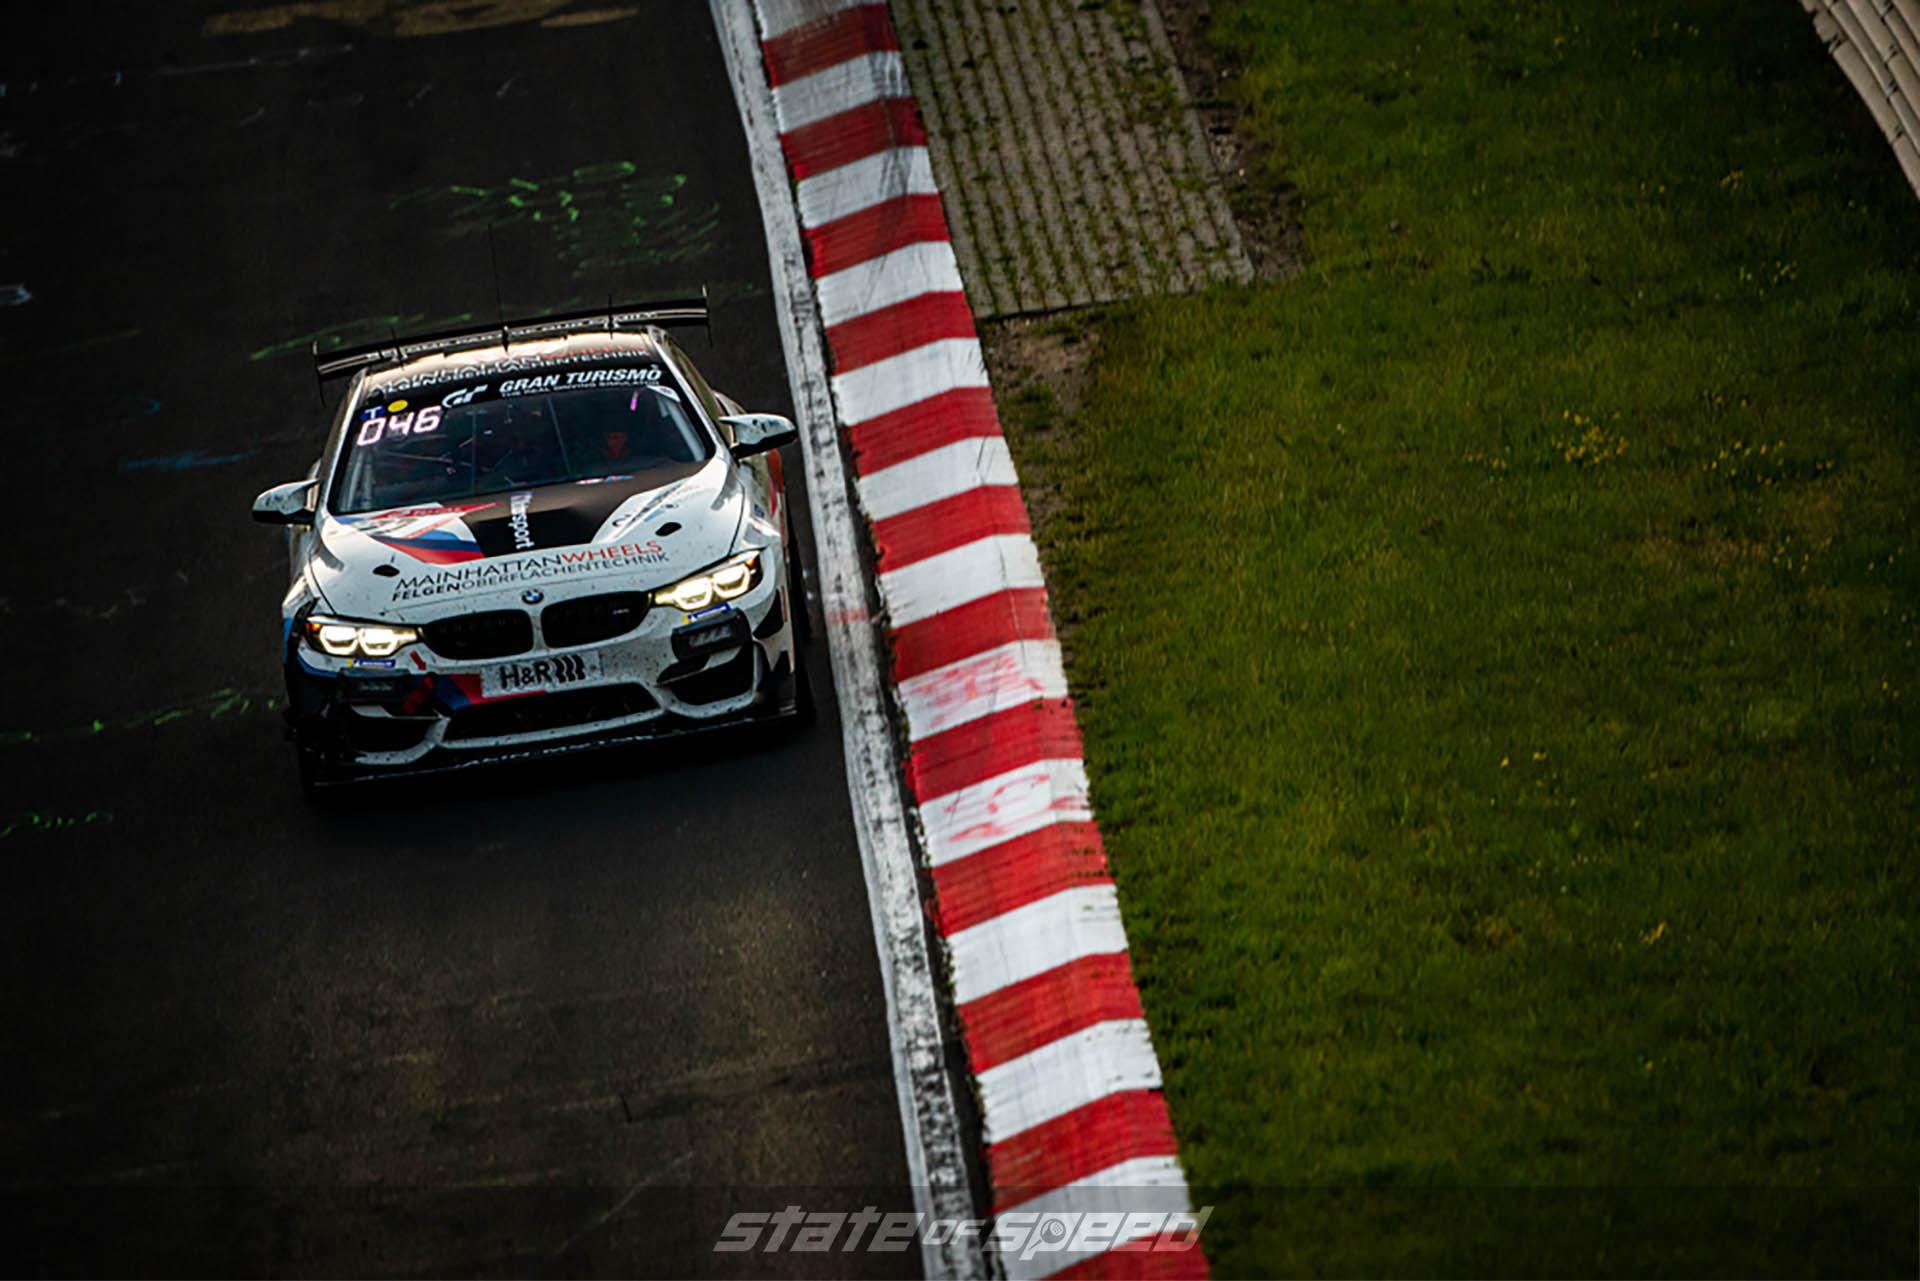 BMW racing at the Nurburgring